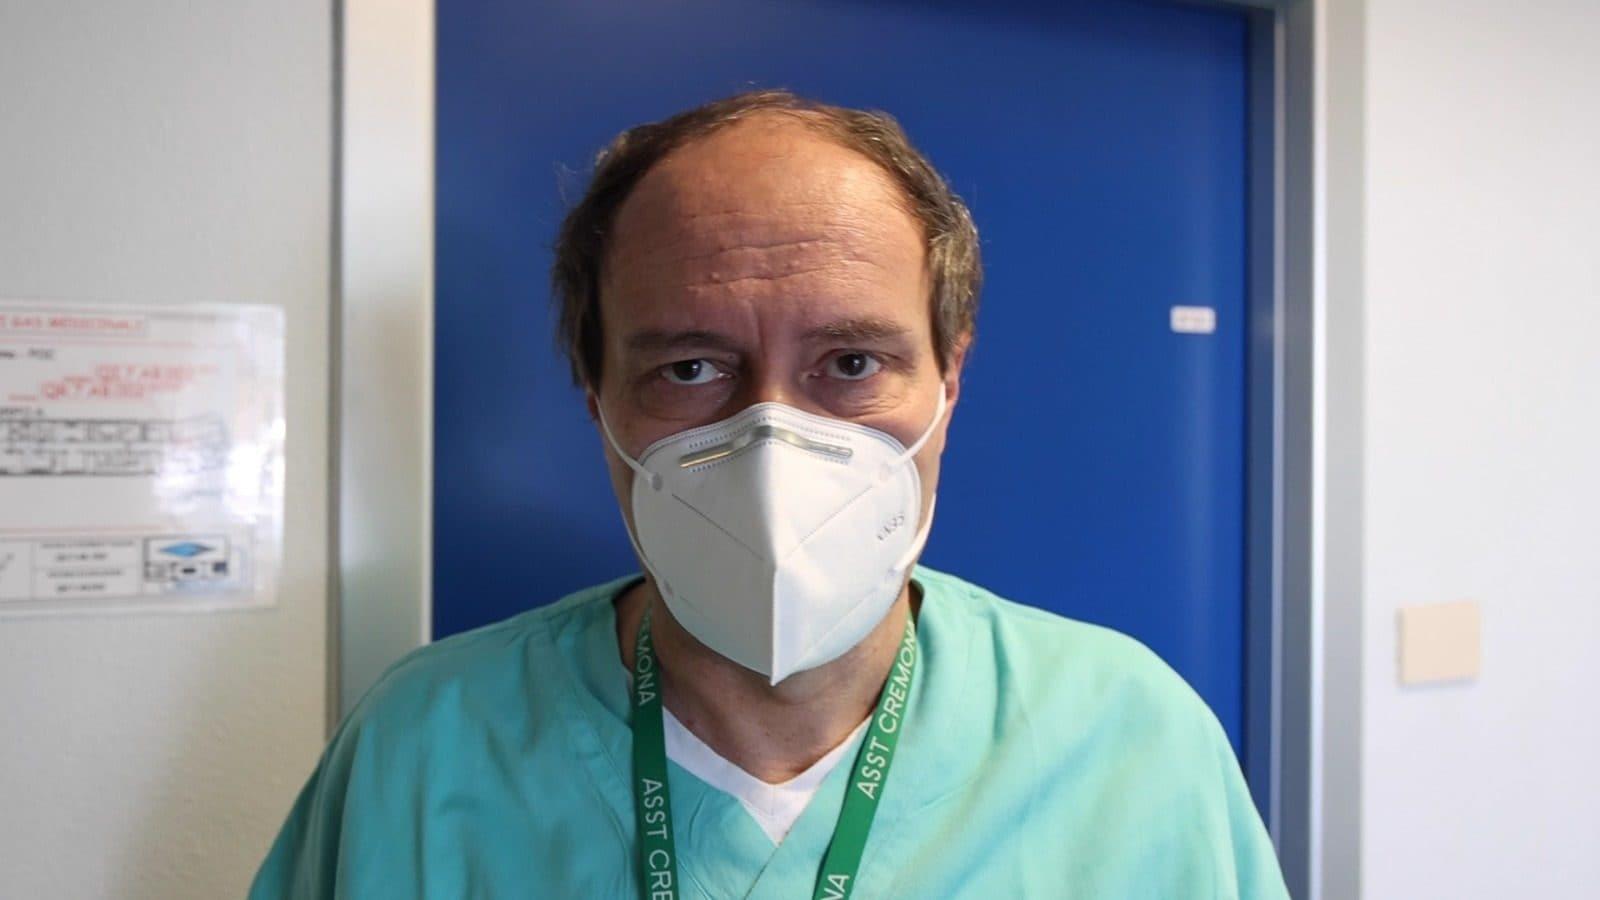 Il dottor Enrico Storti (Foto: Giancristofaro)